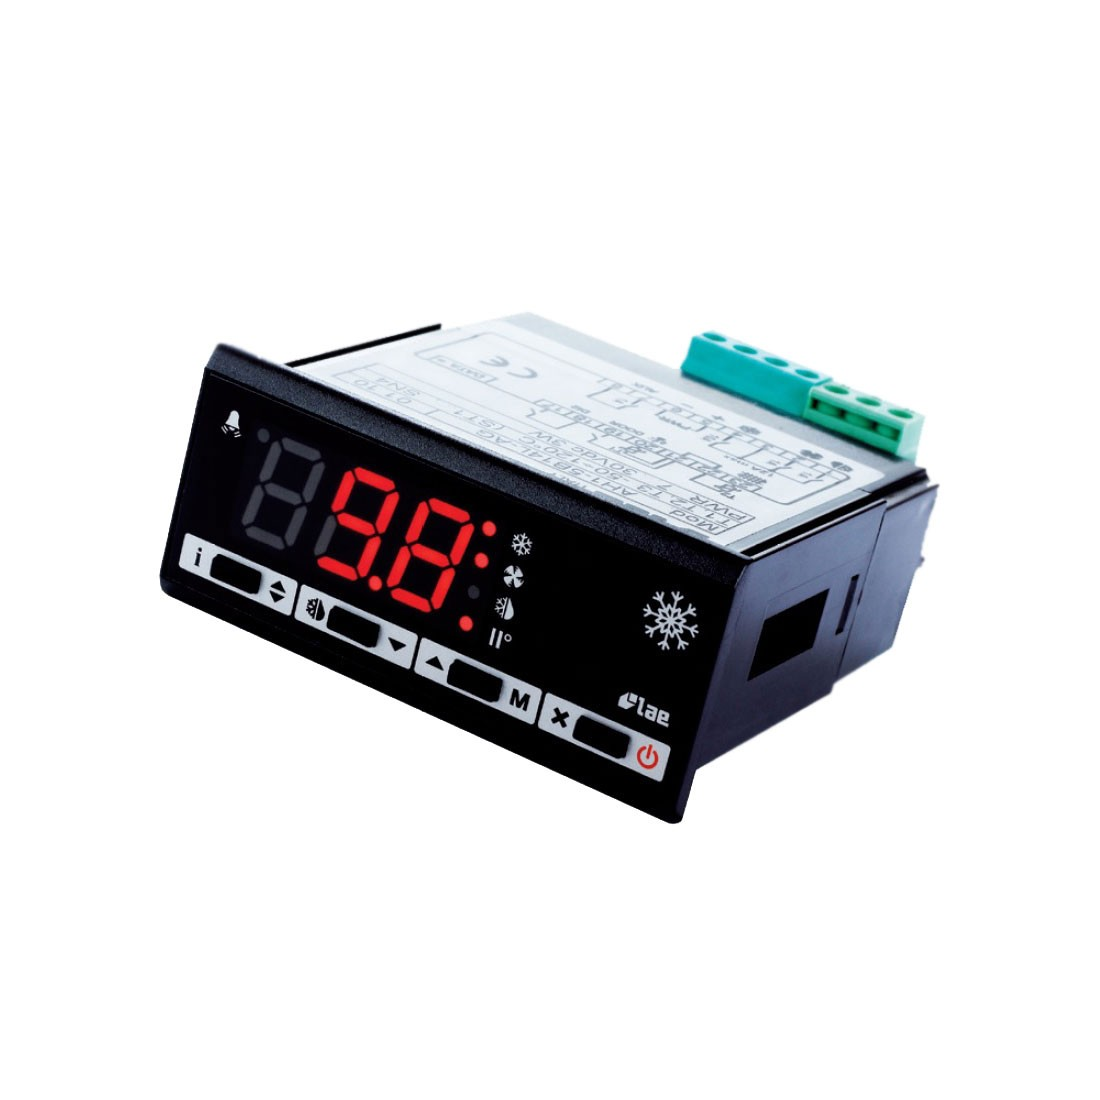 LAE AH1-5B14L-AG Kühlstellenregler mit Gegenheizfunktion (incl. 2xFühler) AH1 5B14L AG